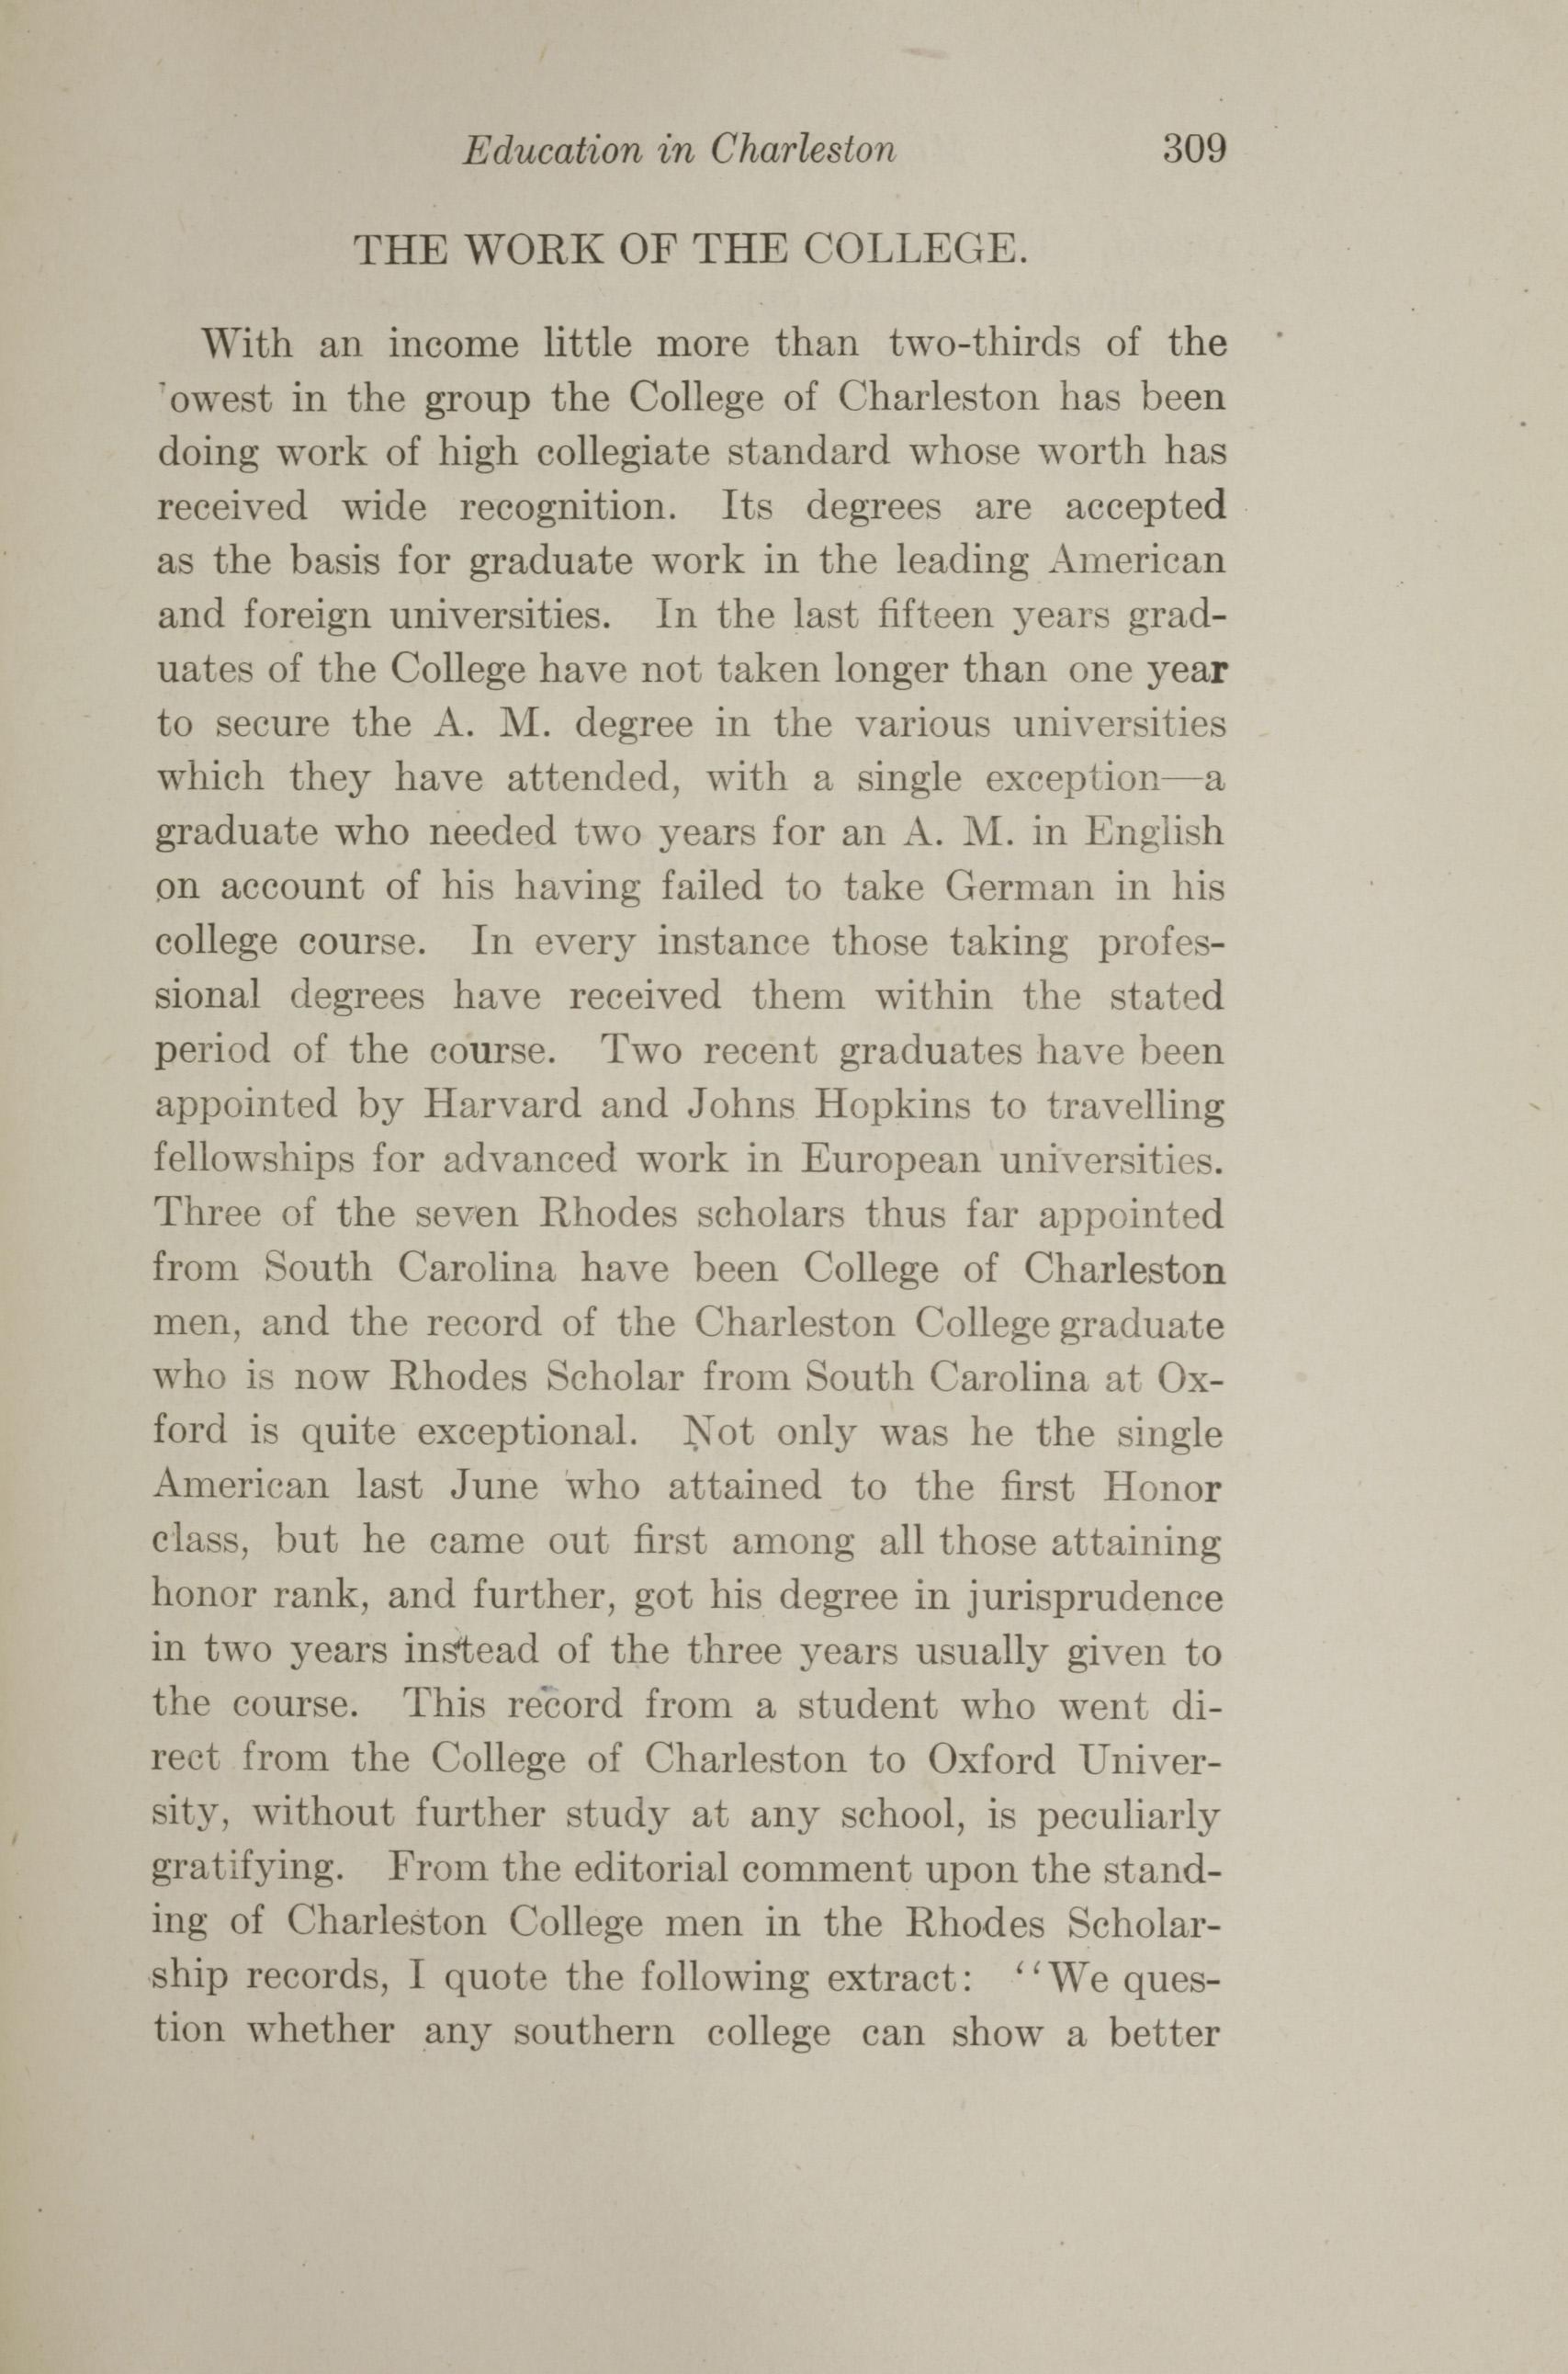 Charleston Yearbook, 1912, page 309